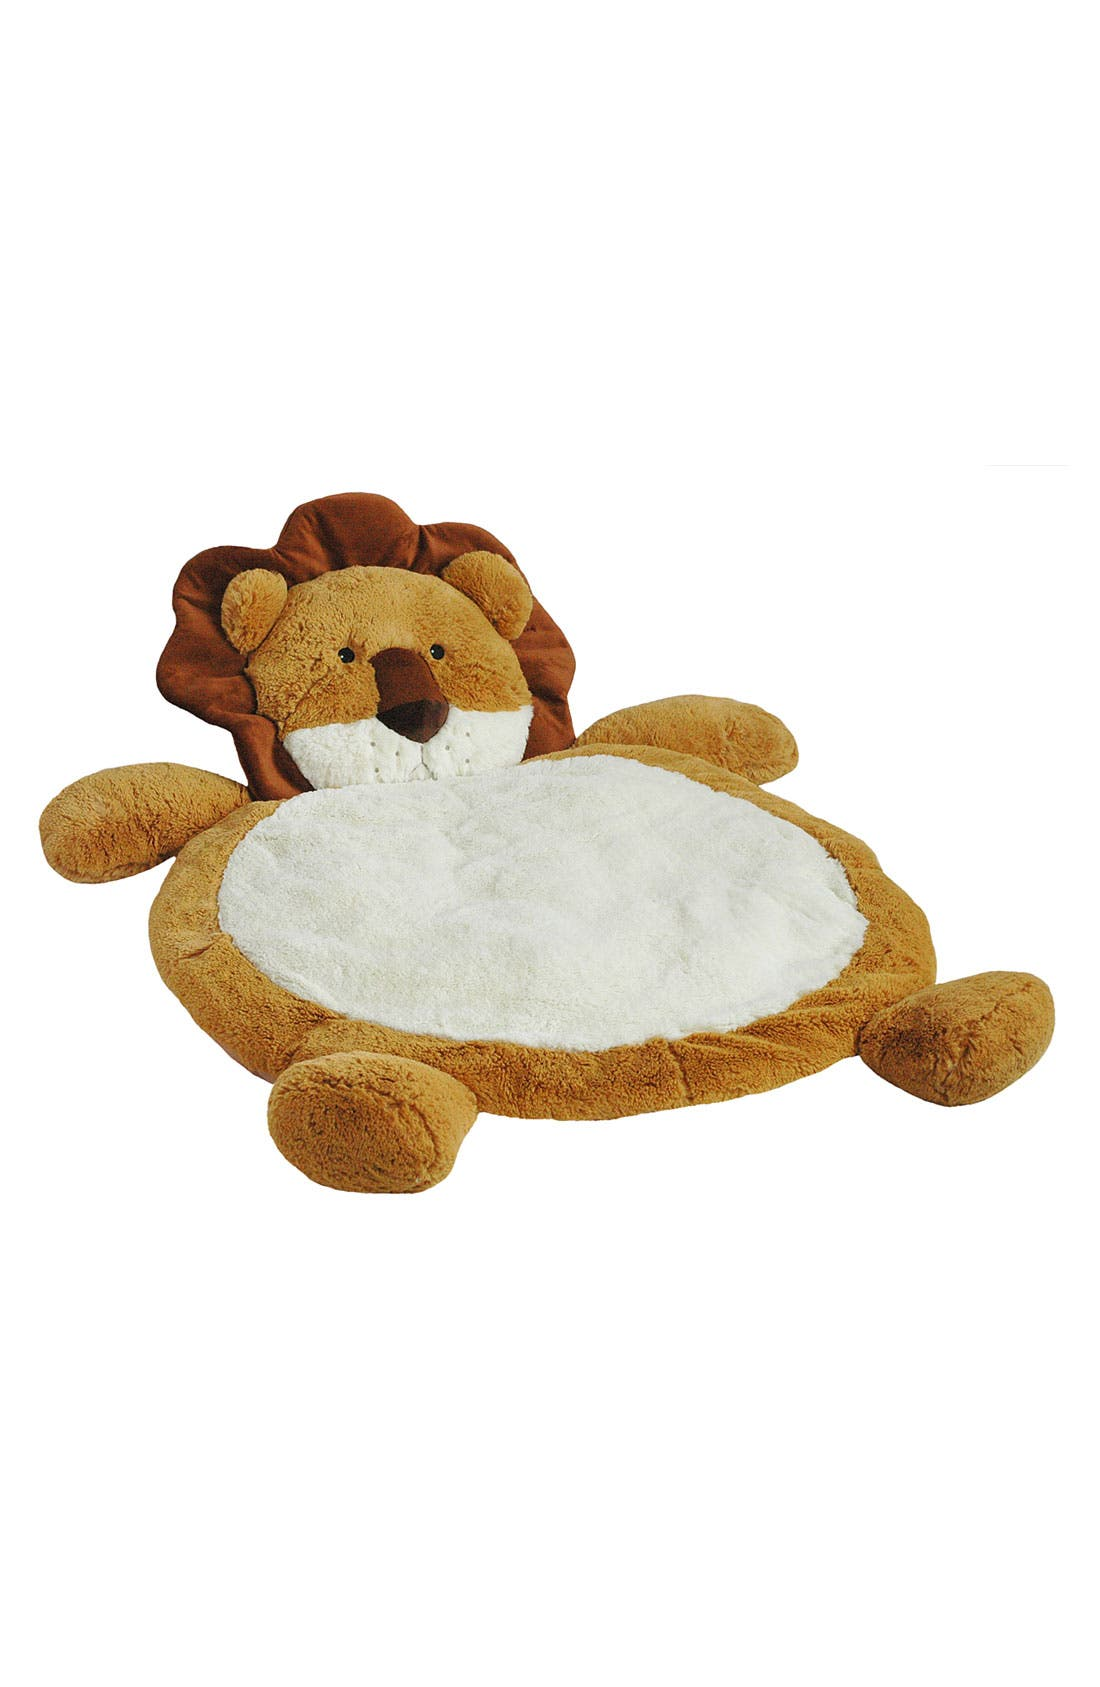 Alternate Image 1 Selected - Bestever 'In Baby' Plush Mat